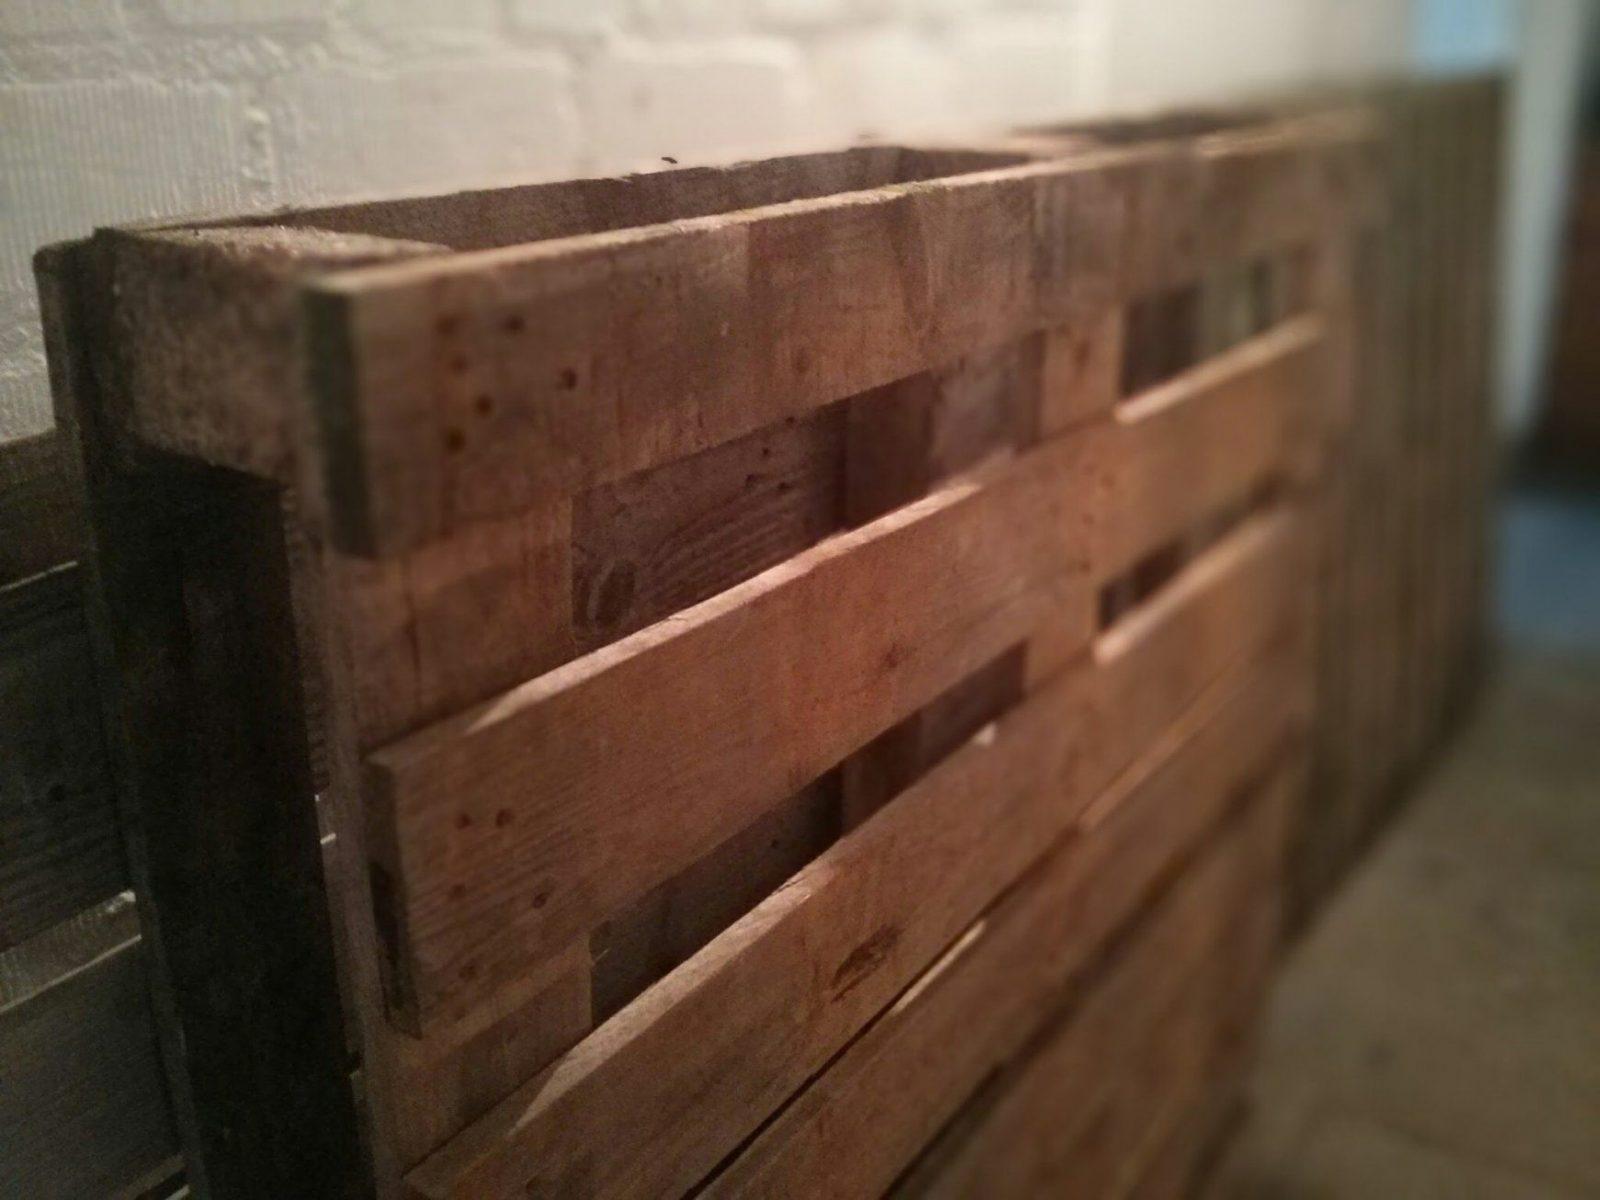 Theke Selber Bauen Holz Mit Candy Bar Selber Bauen Aus Paletten Teil von Theke Bar Selber Bauen Bild